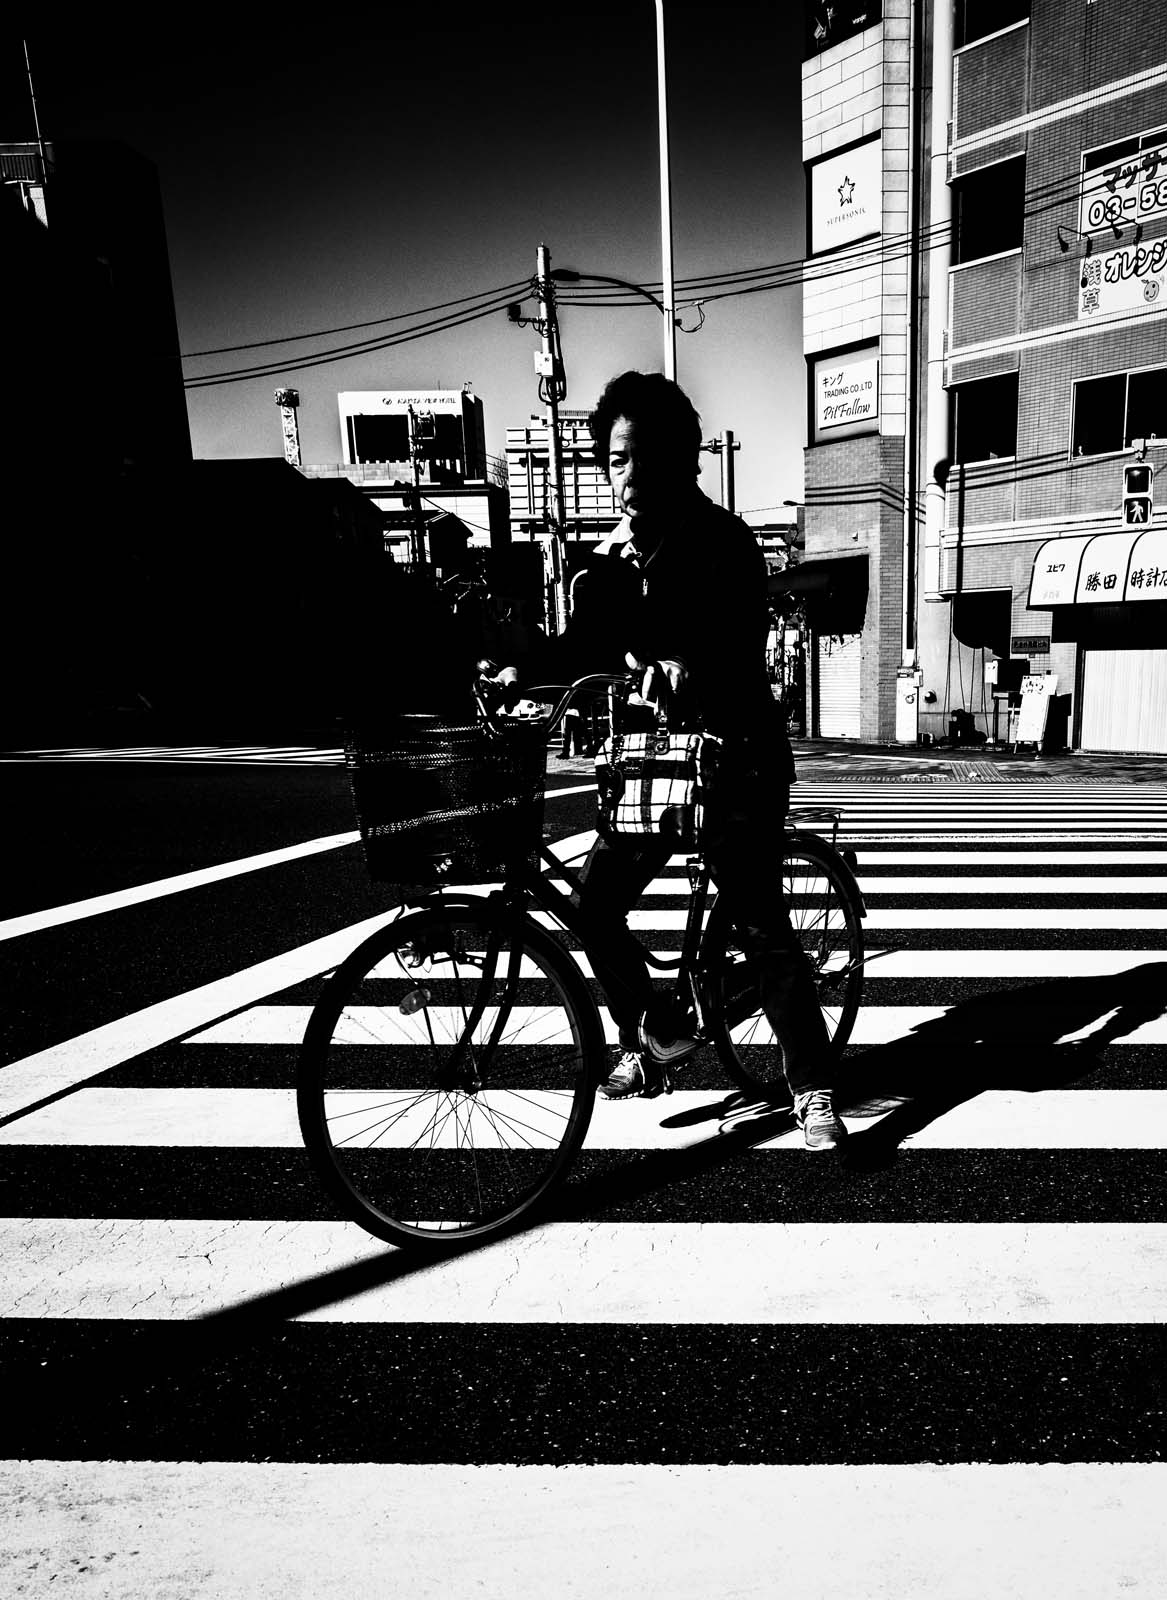 Straßenfoto